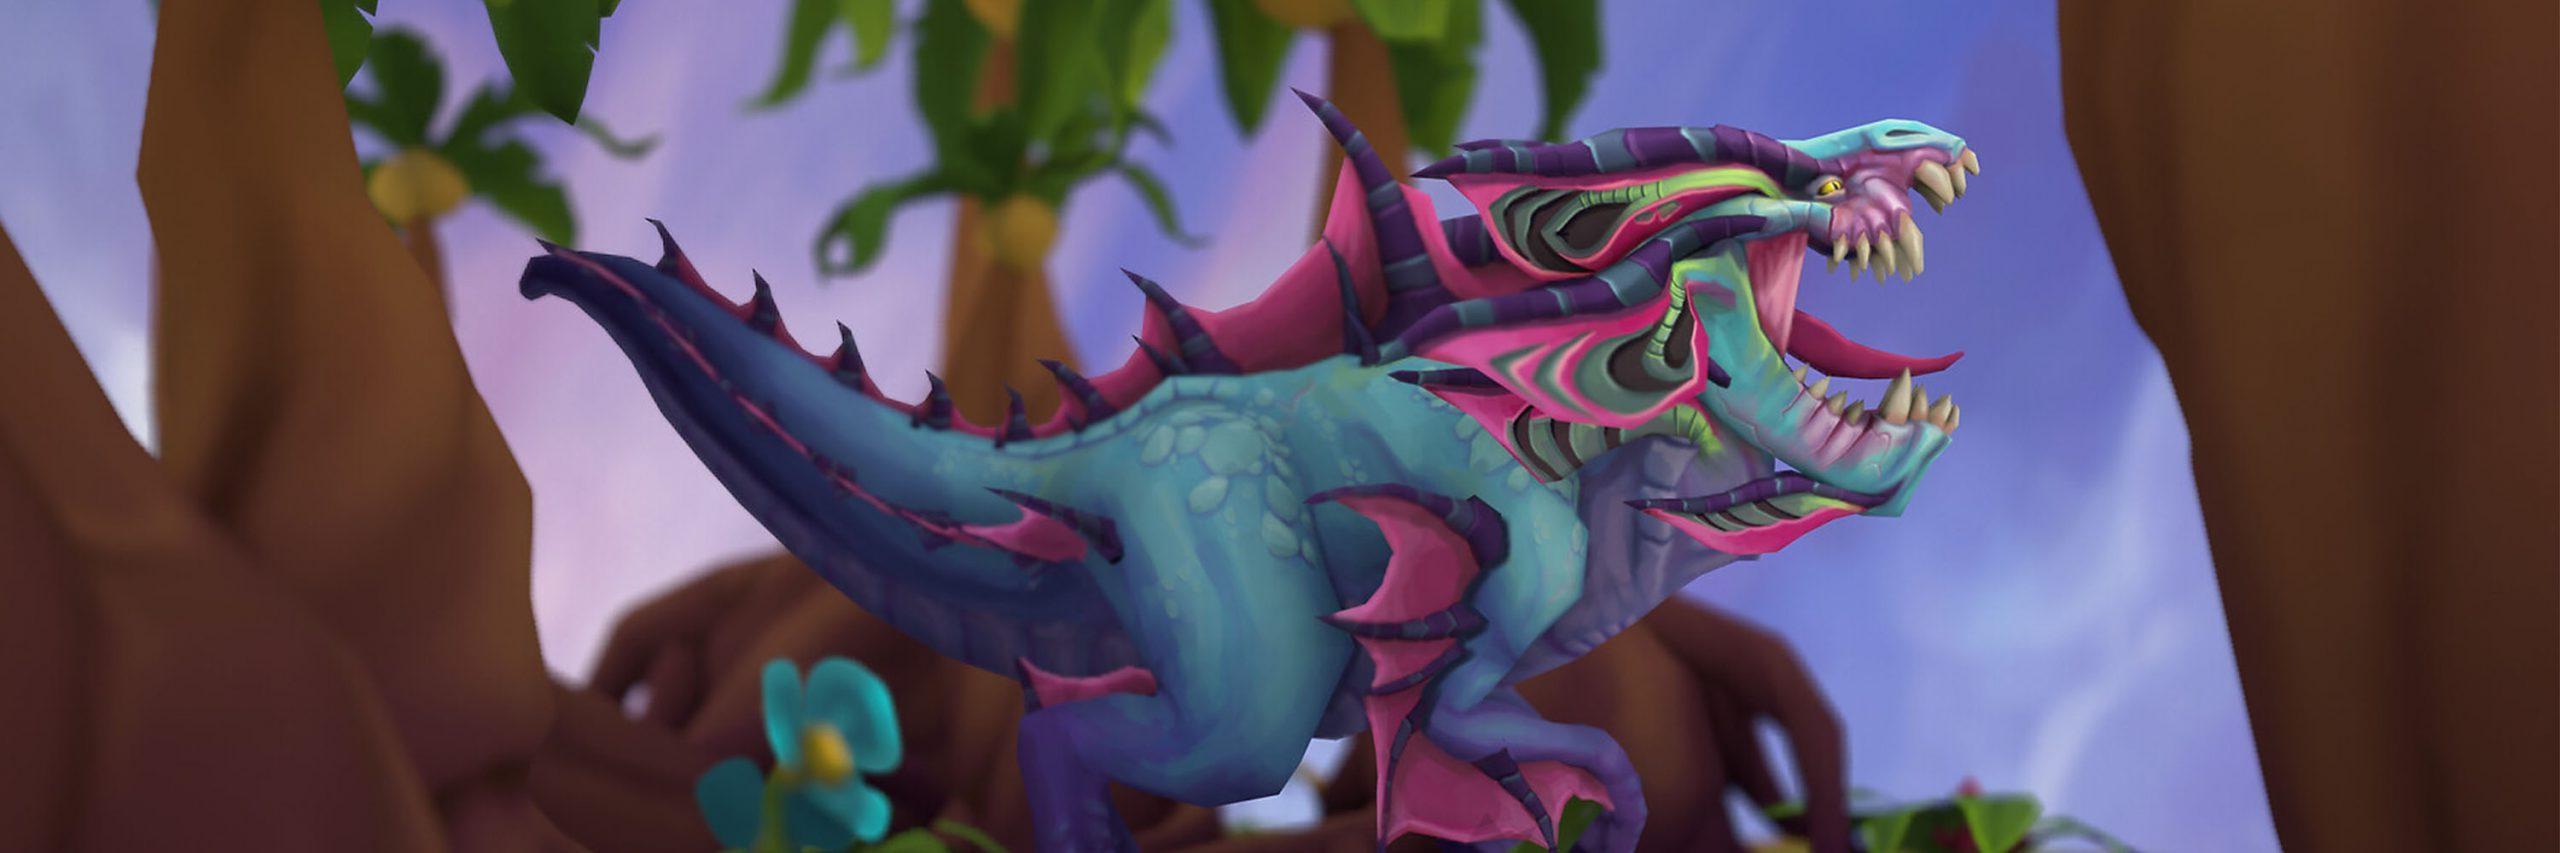 pavosaurus_rex_header